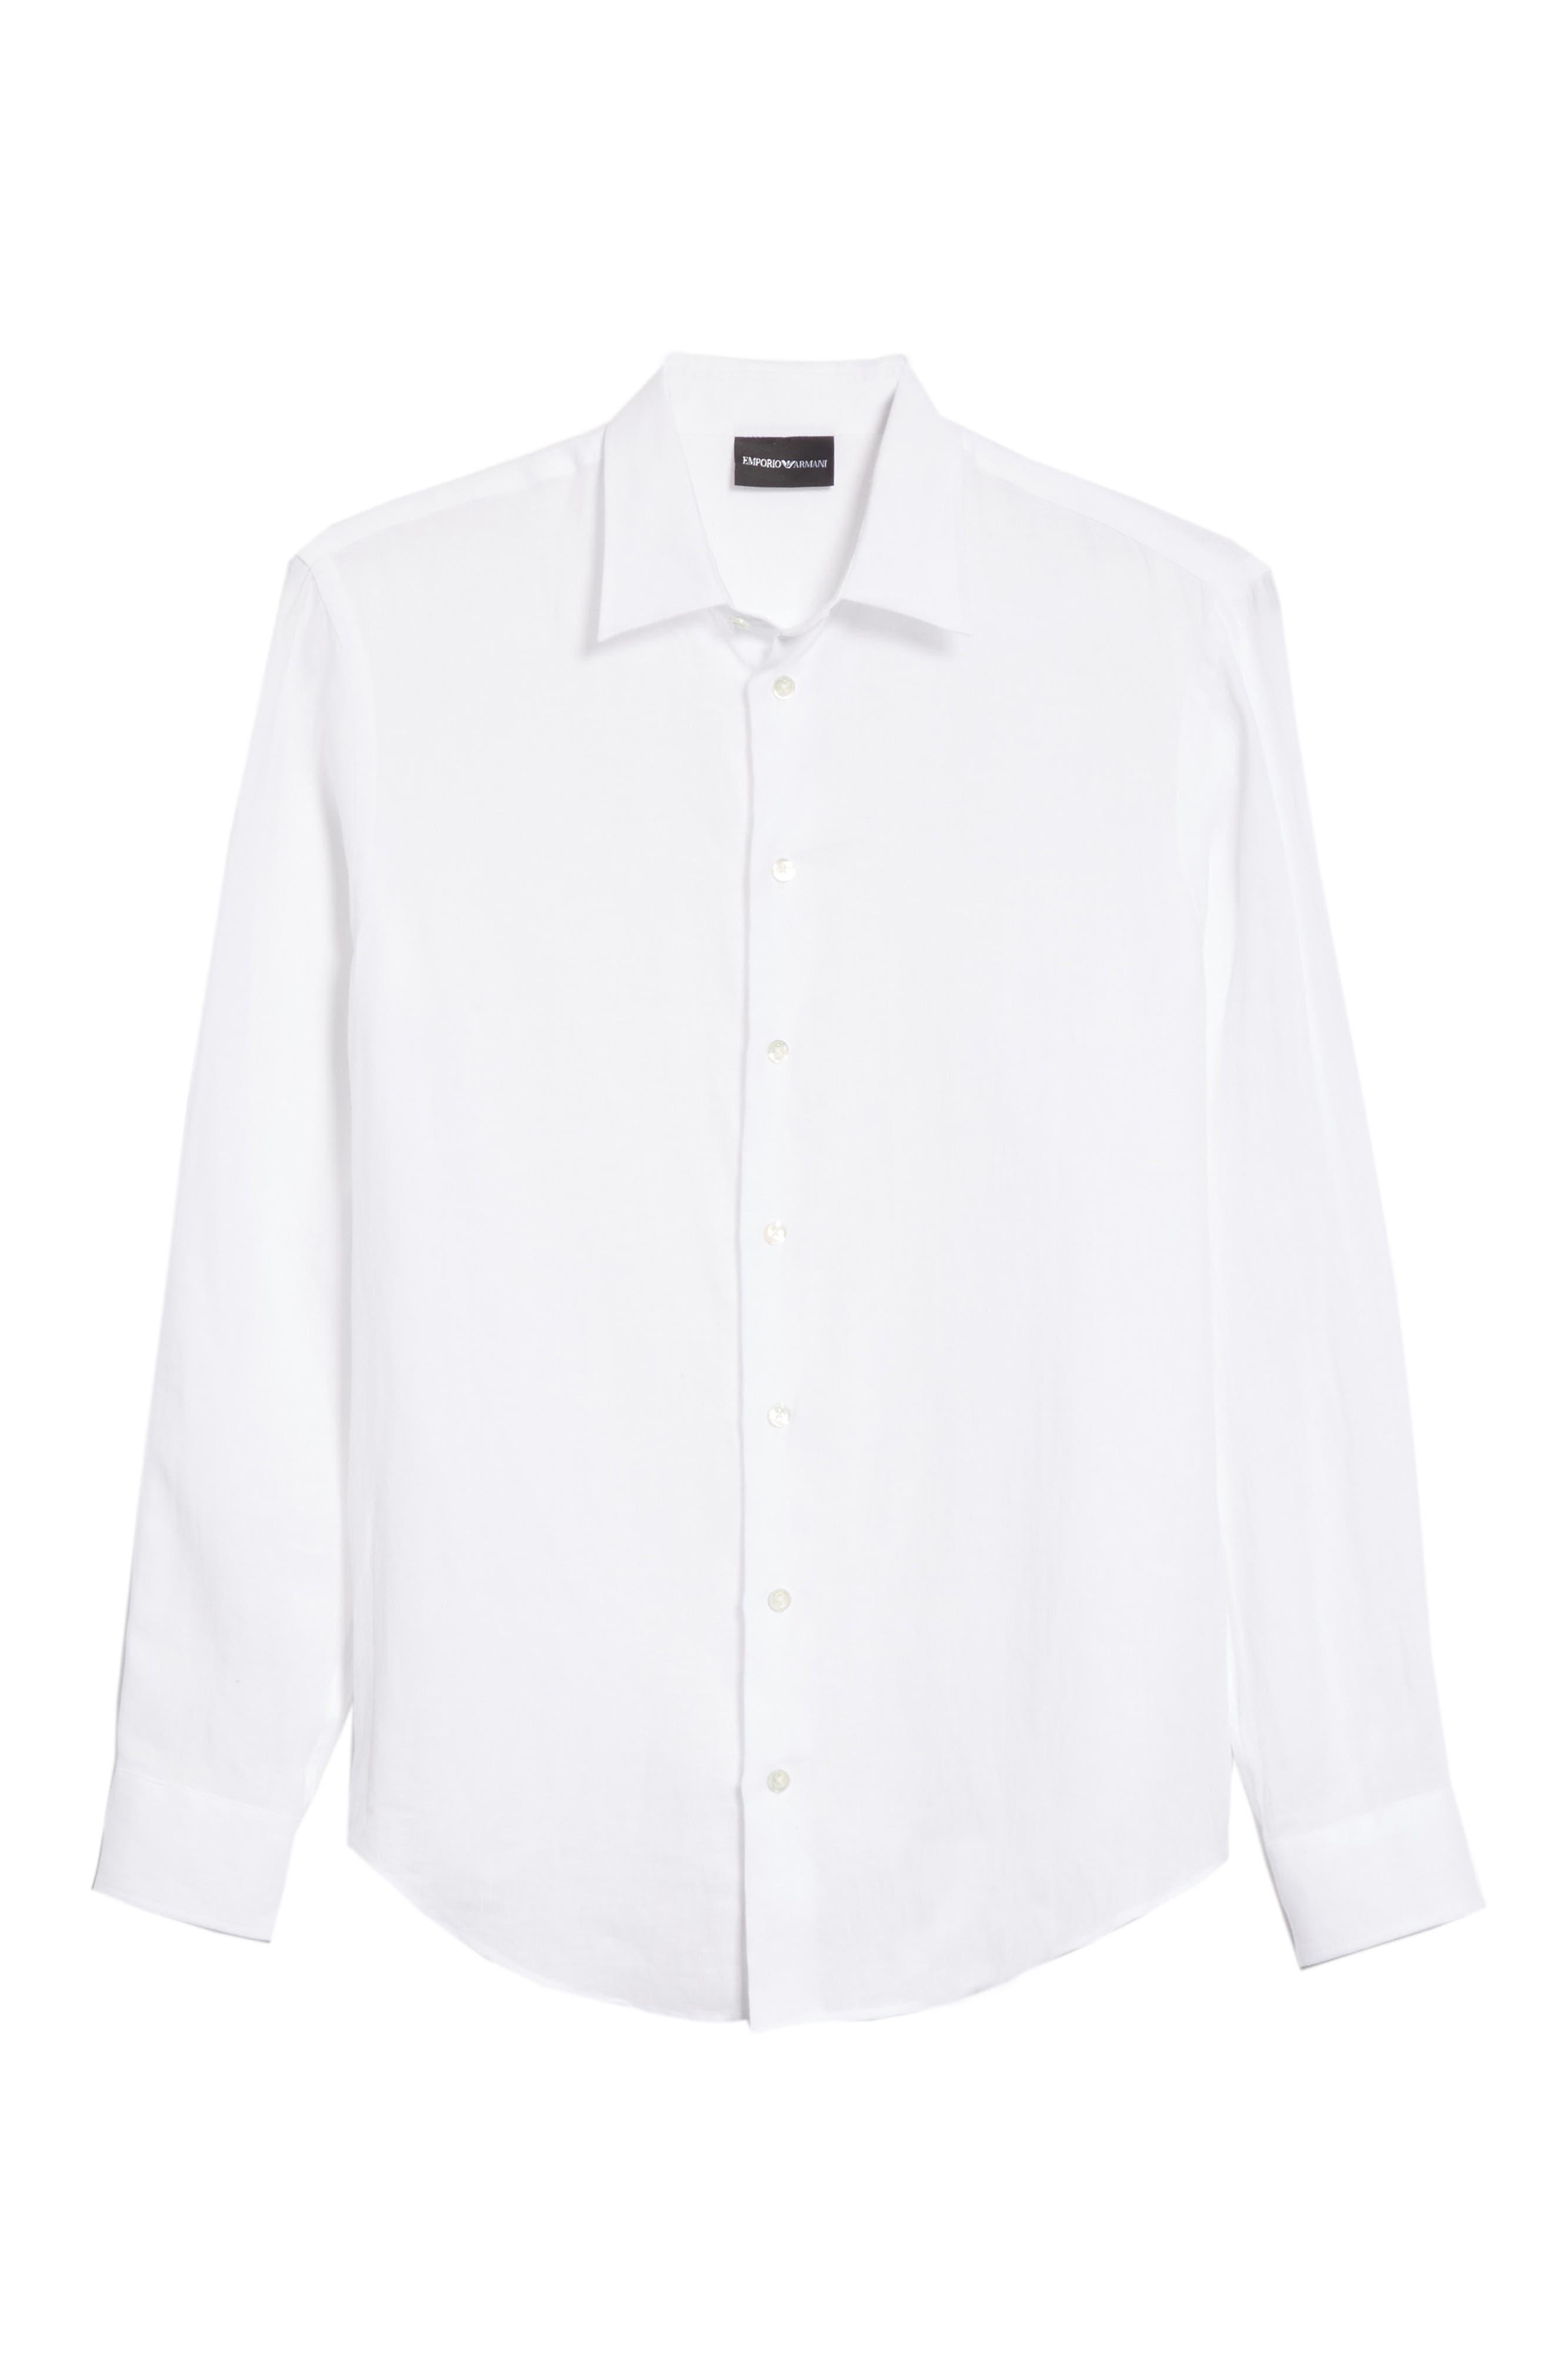 Regular Fit Linen Sport Shirt,                             Alternate thumbnail 6, color,                             100